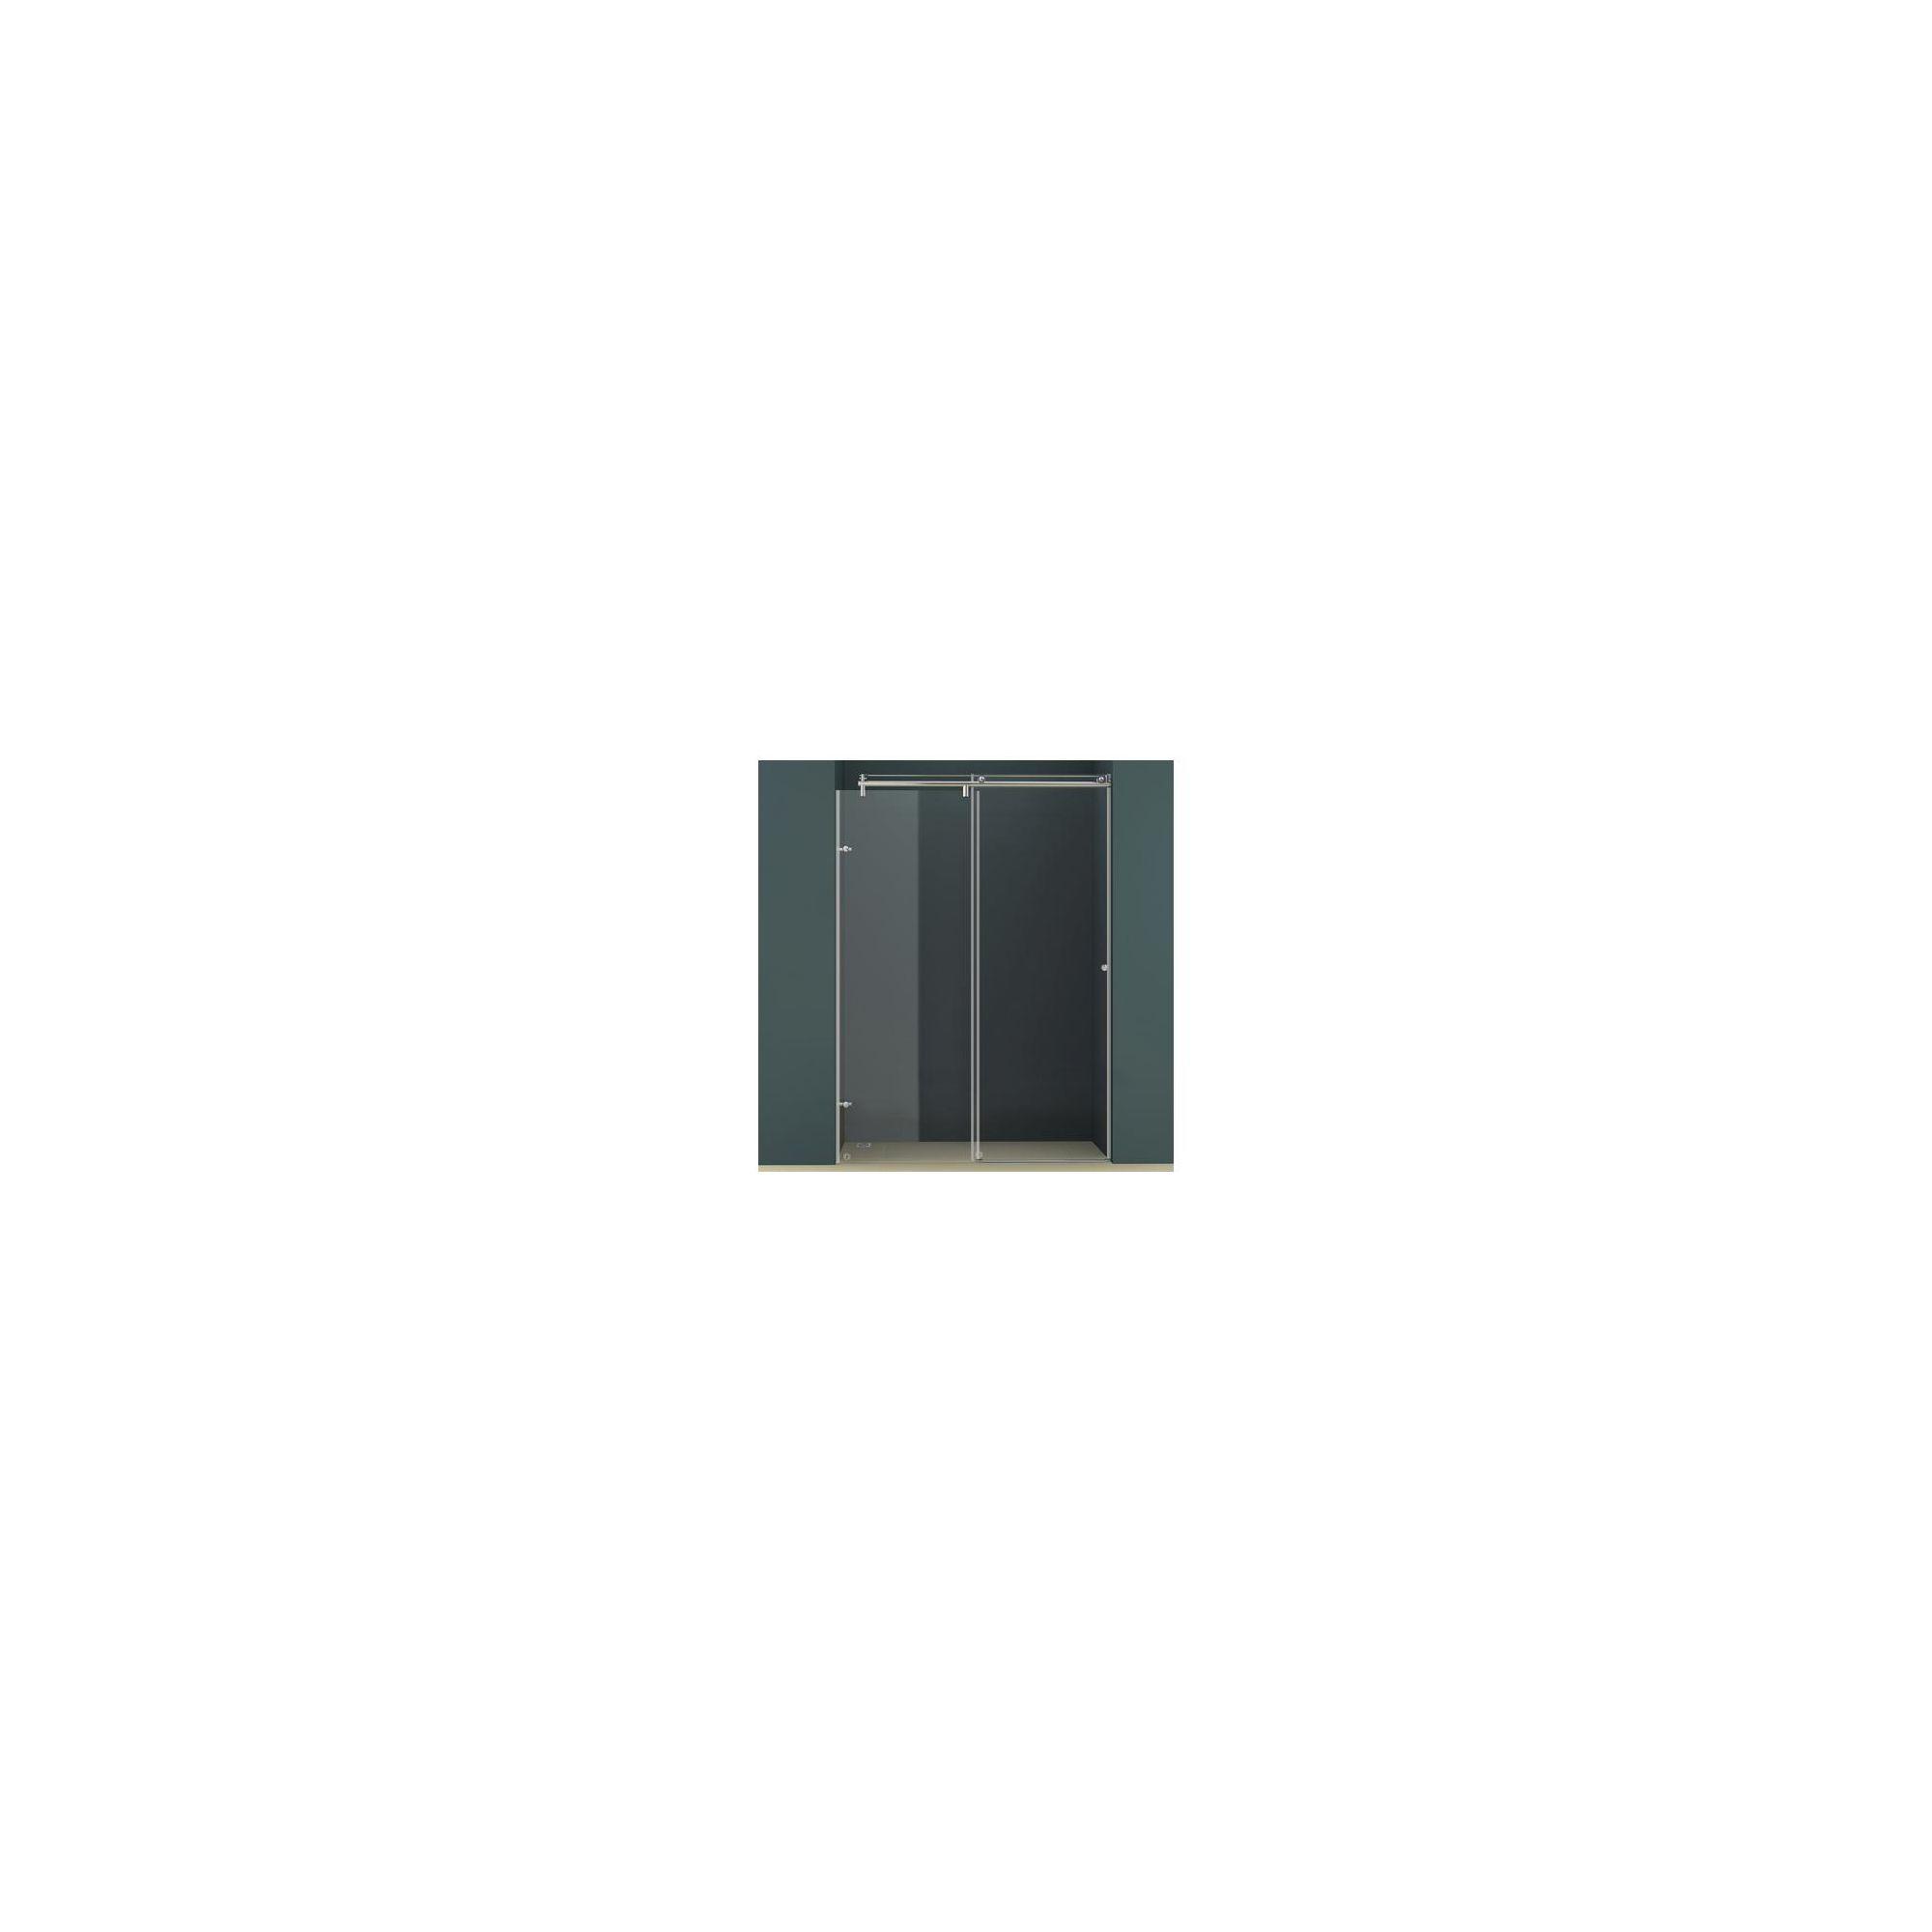 Vessini K Series Sliding Shower Door, 1400mm Wide, 10mm Glass at Tesco Direct